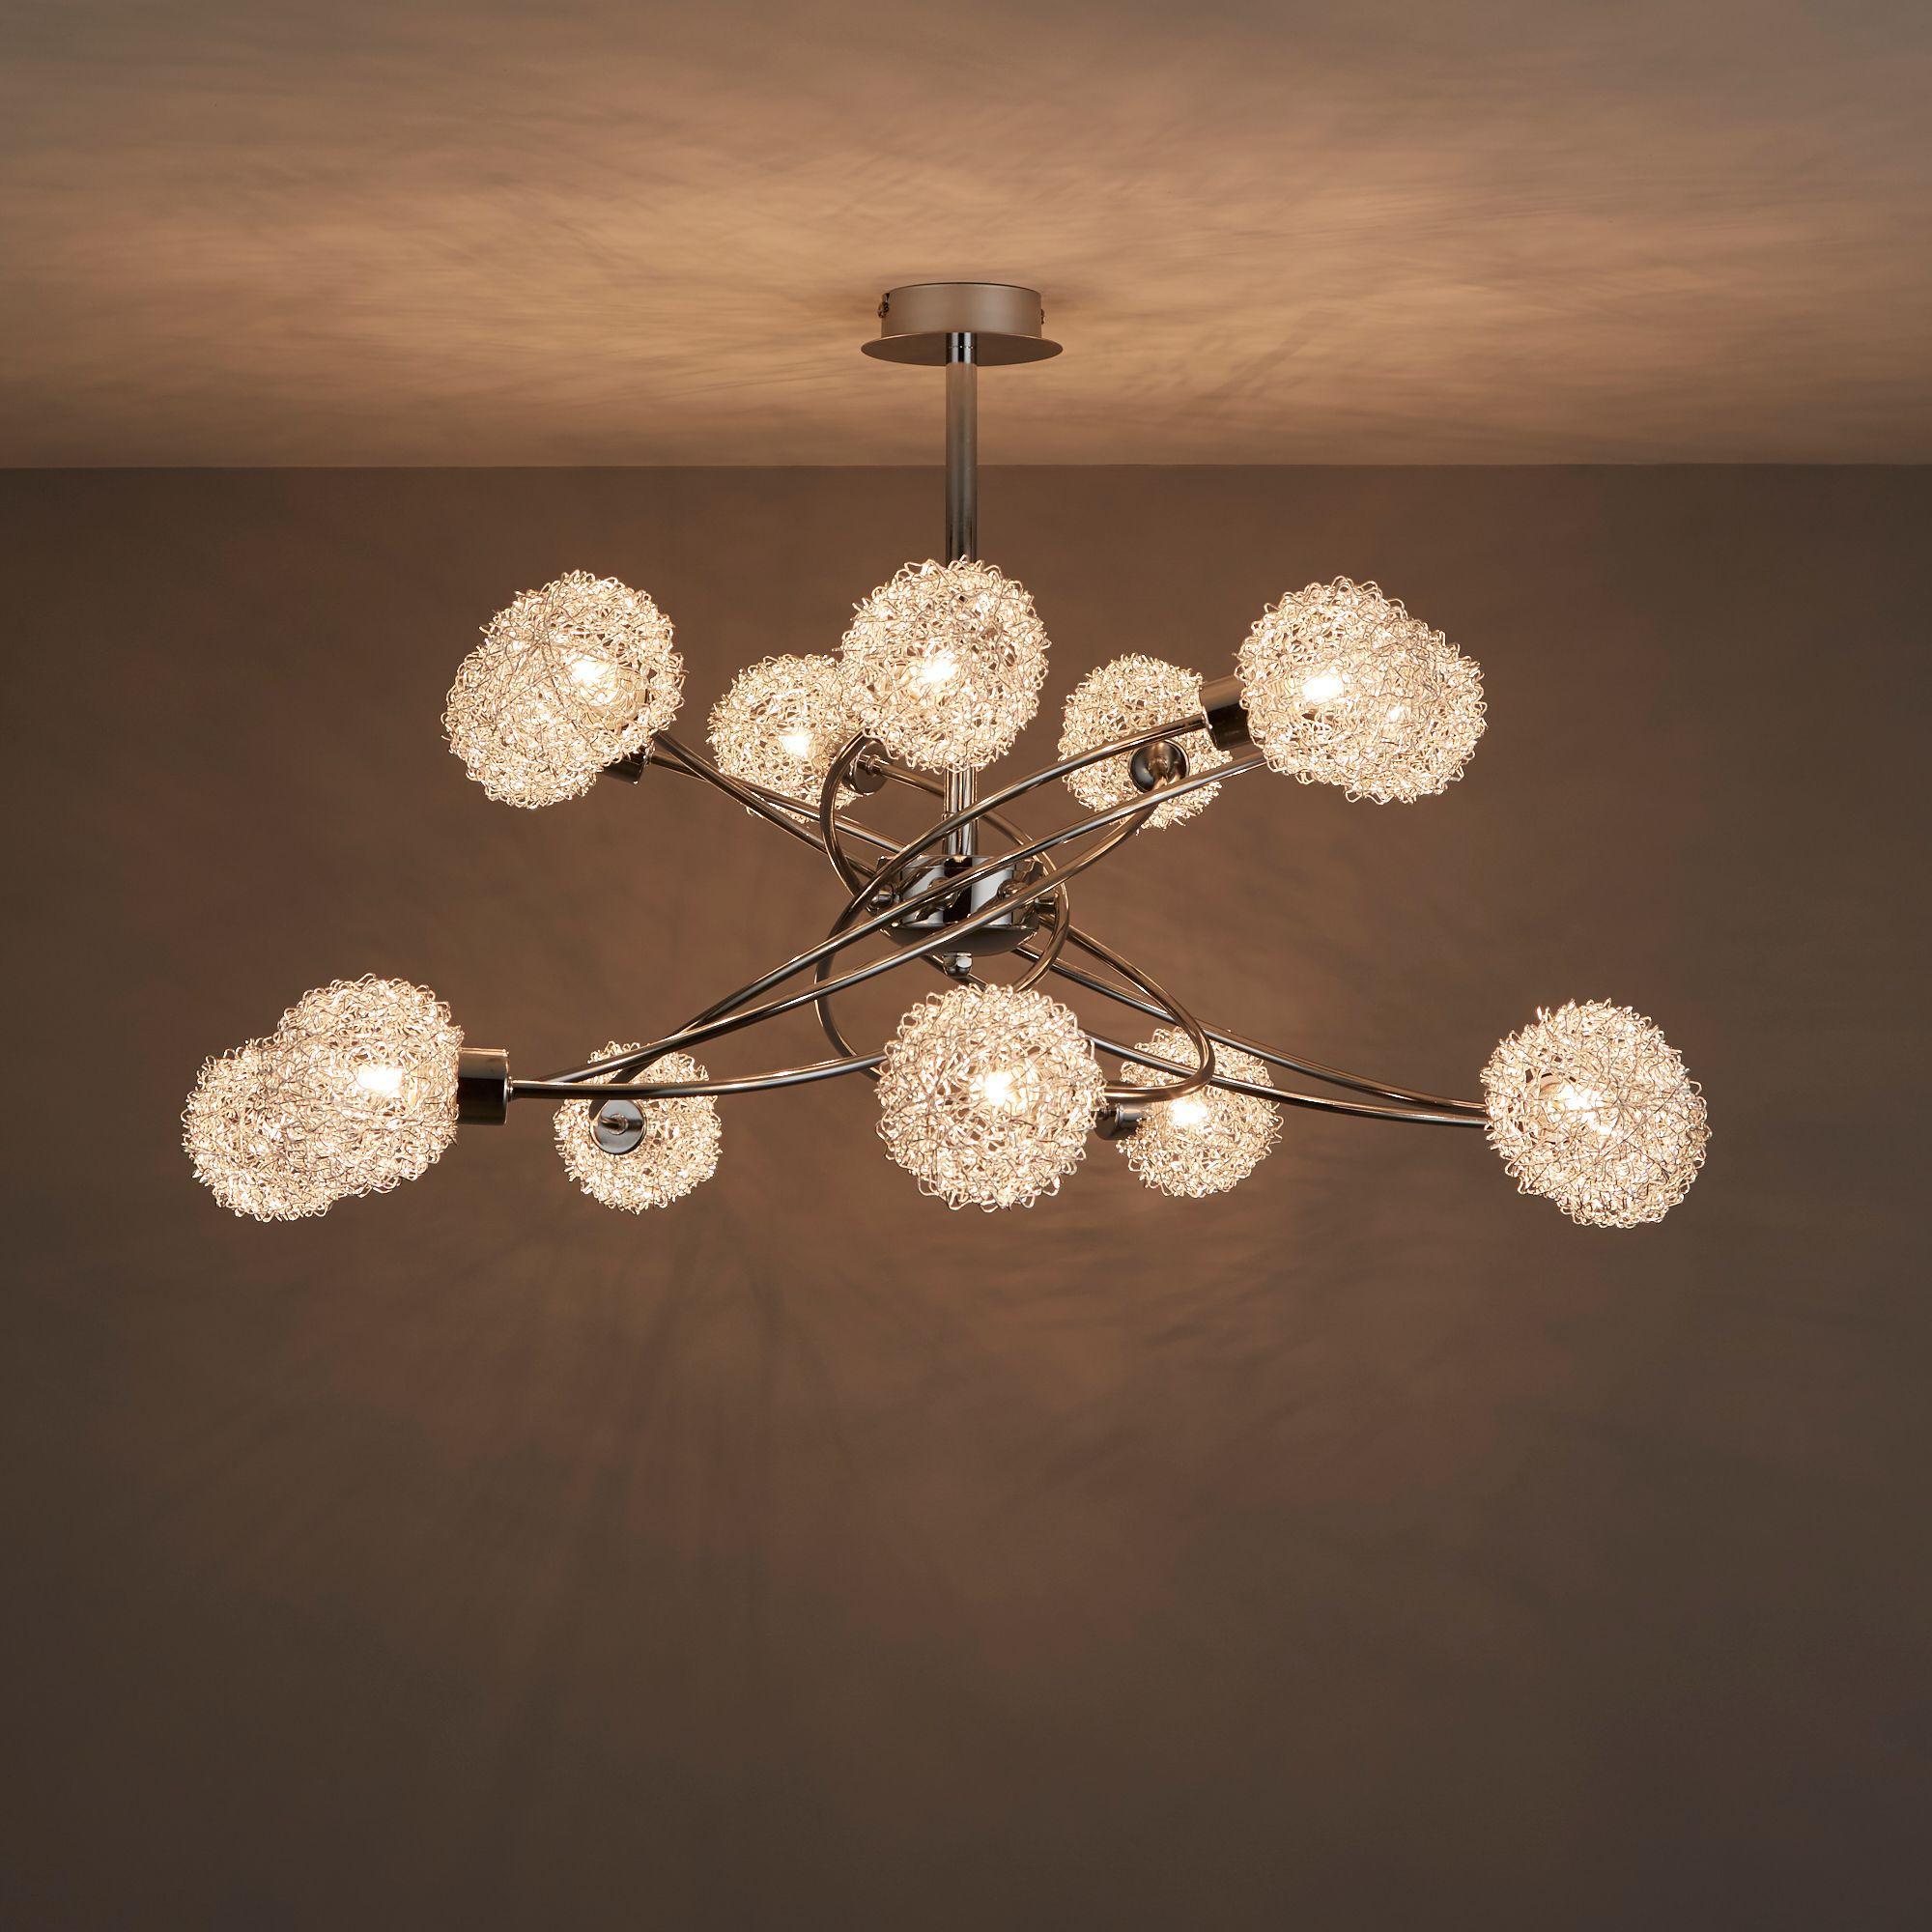 Caelus Chrome Effect 14 Lamp Ceiling Light